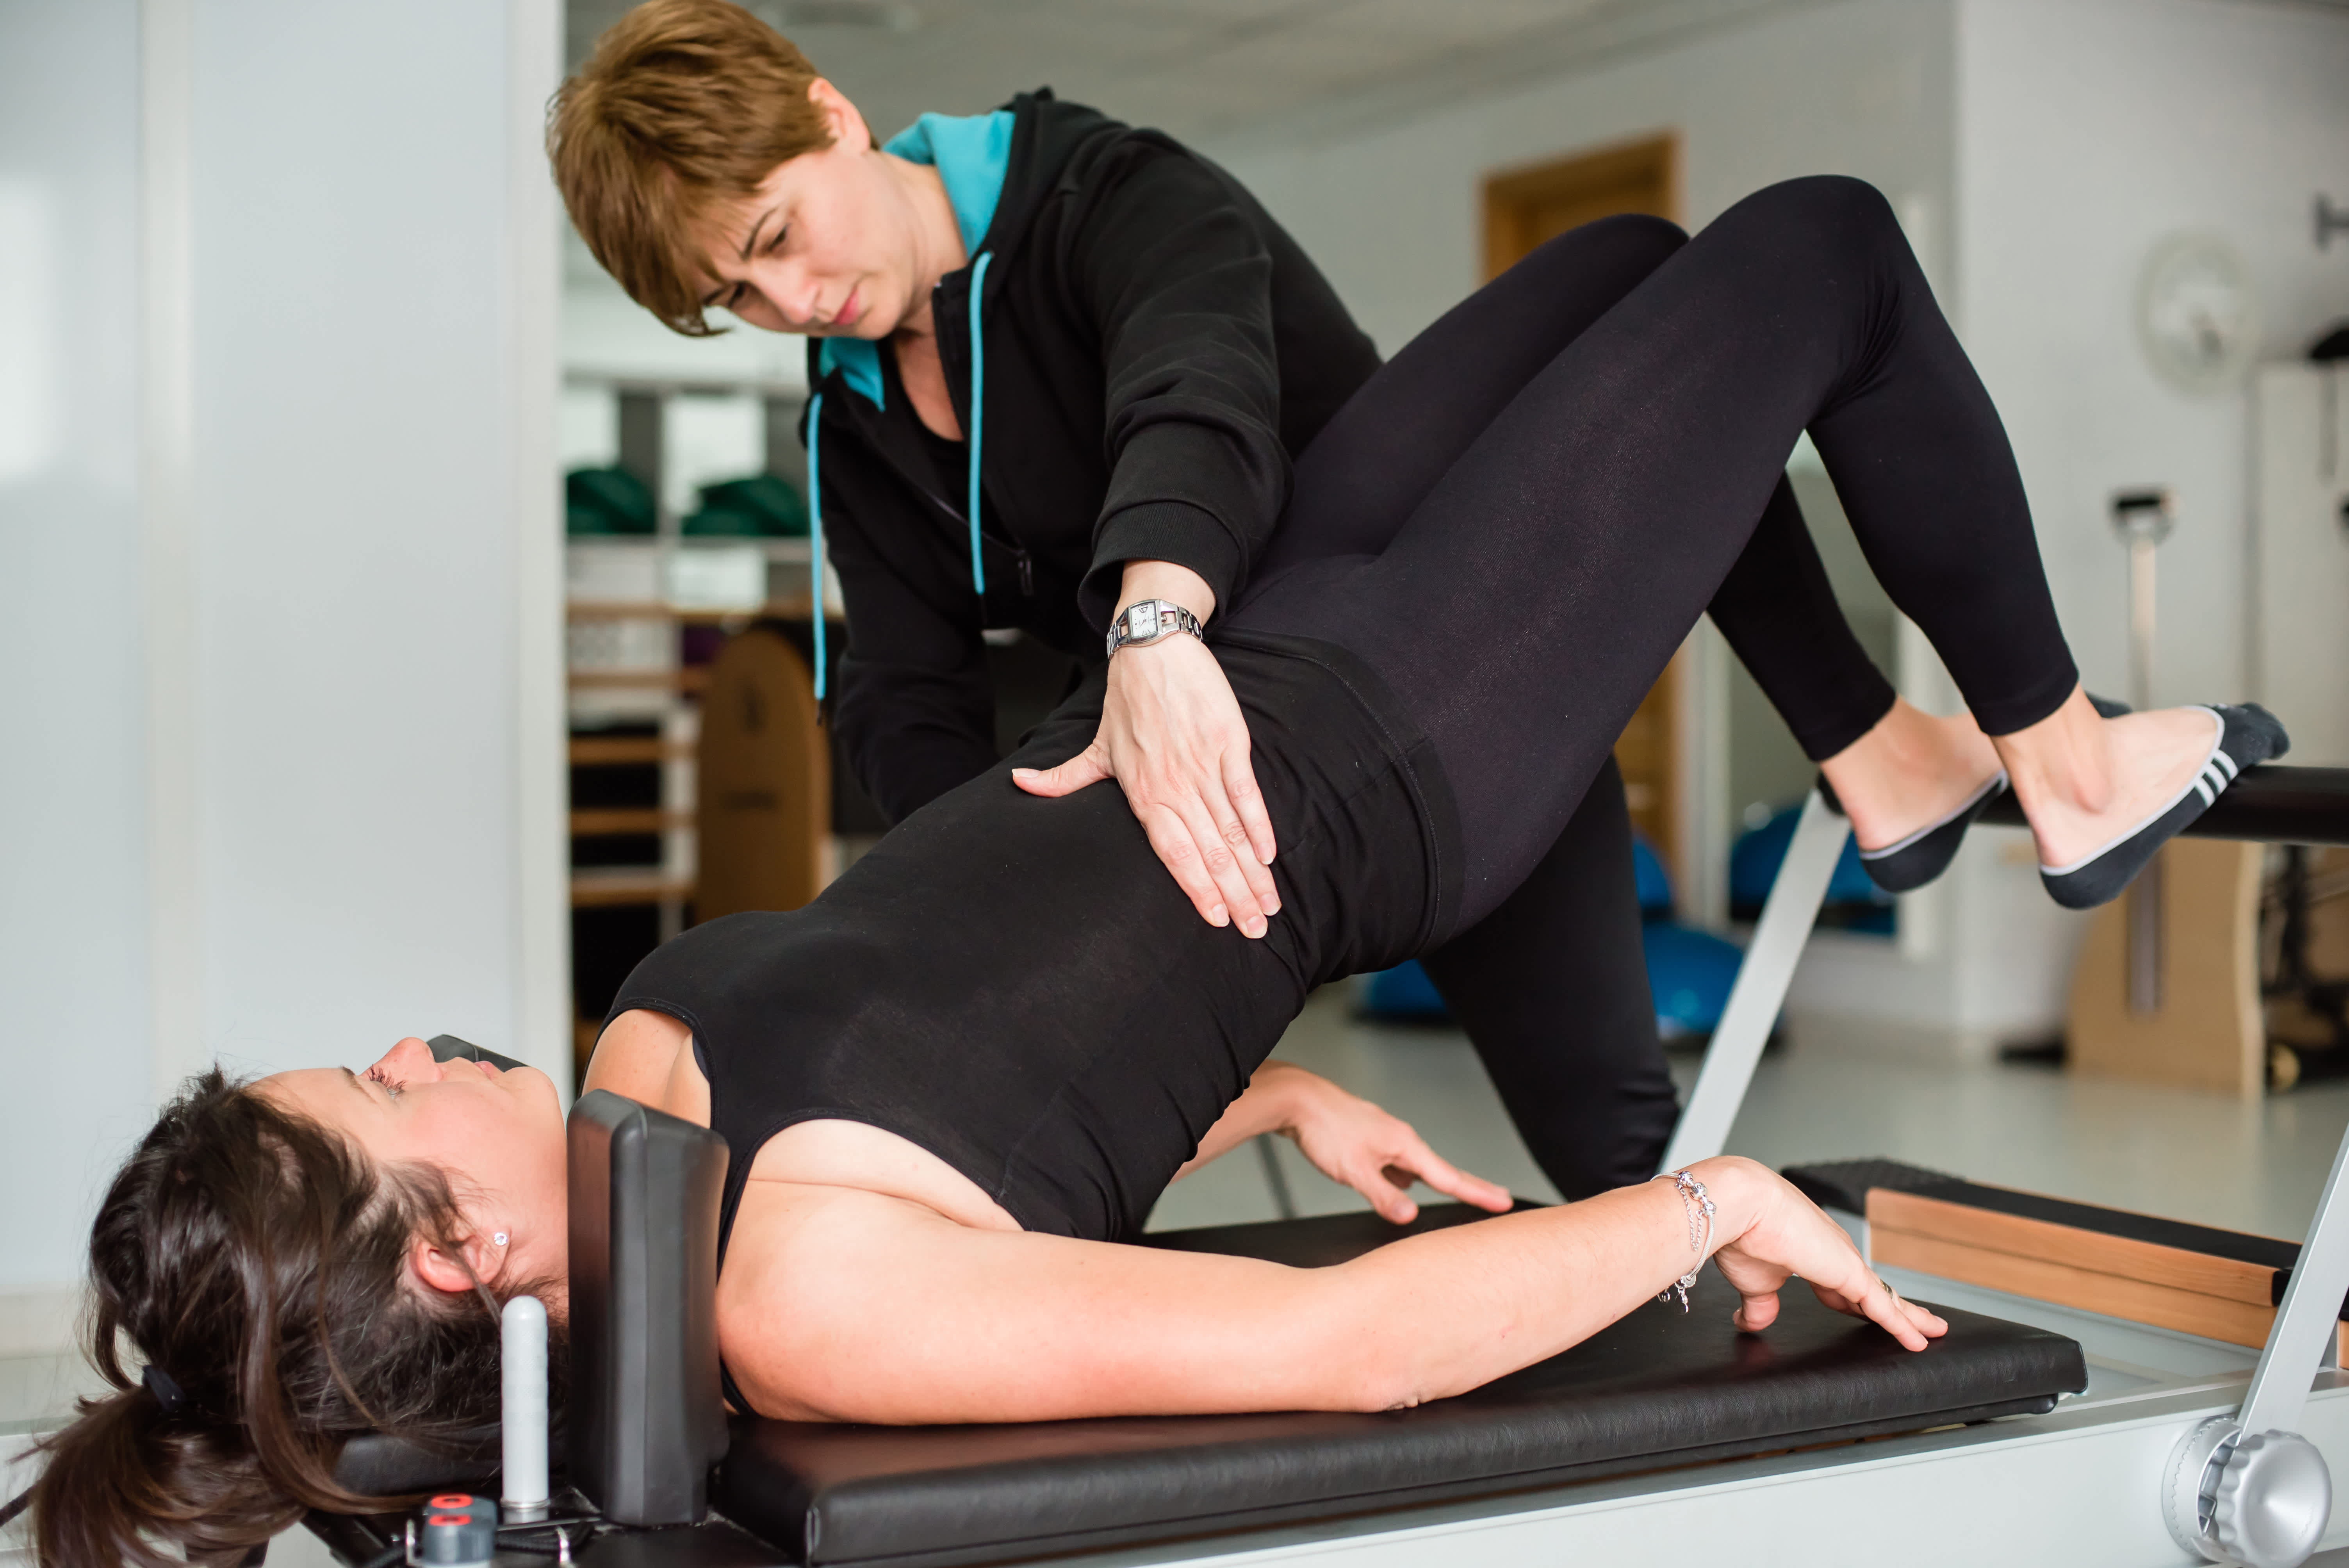 1 clase particular de Pilates a la semana con aparatos